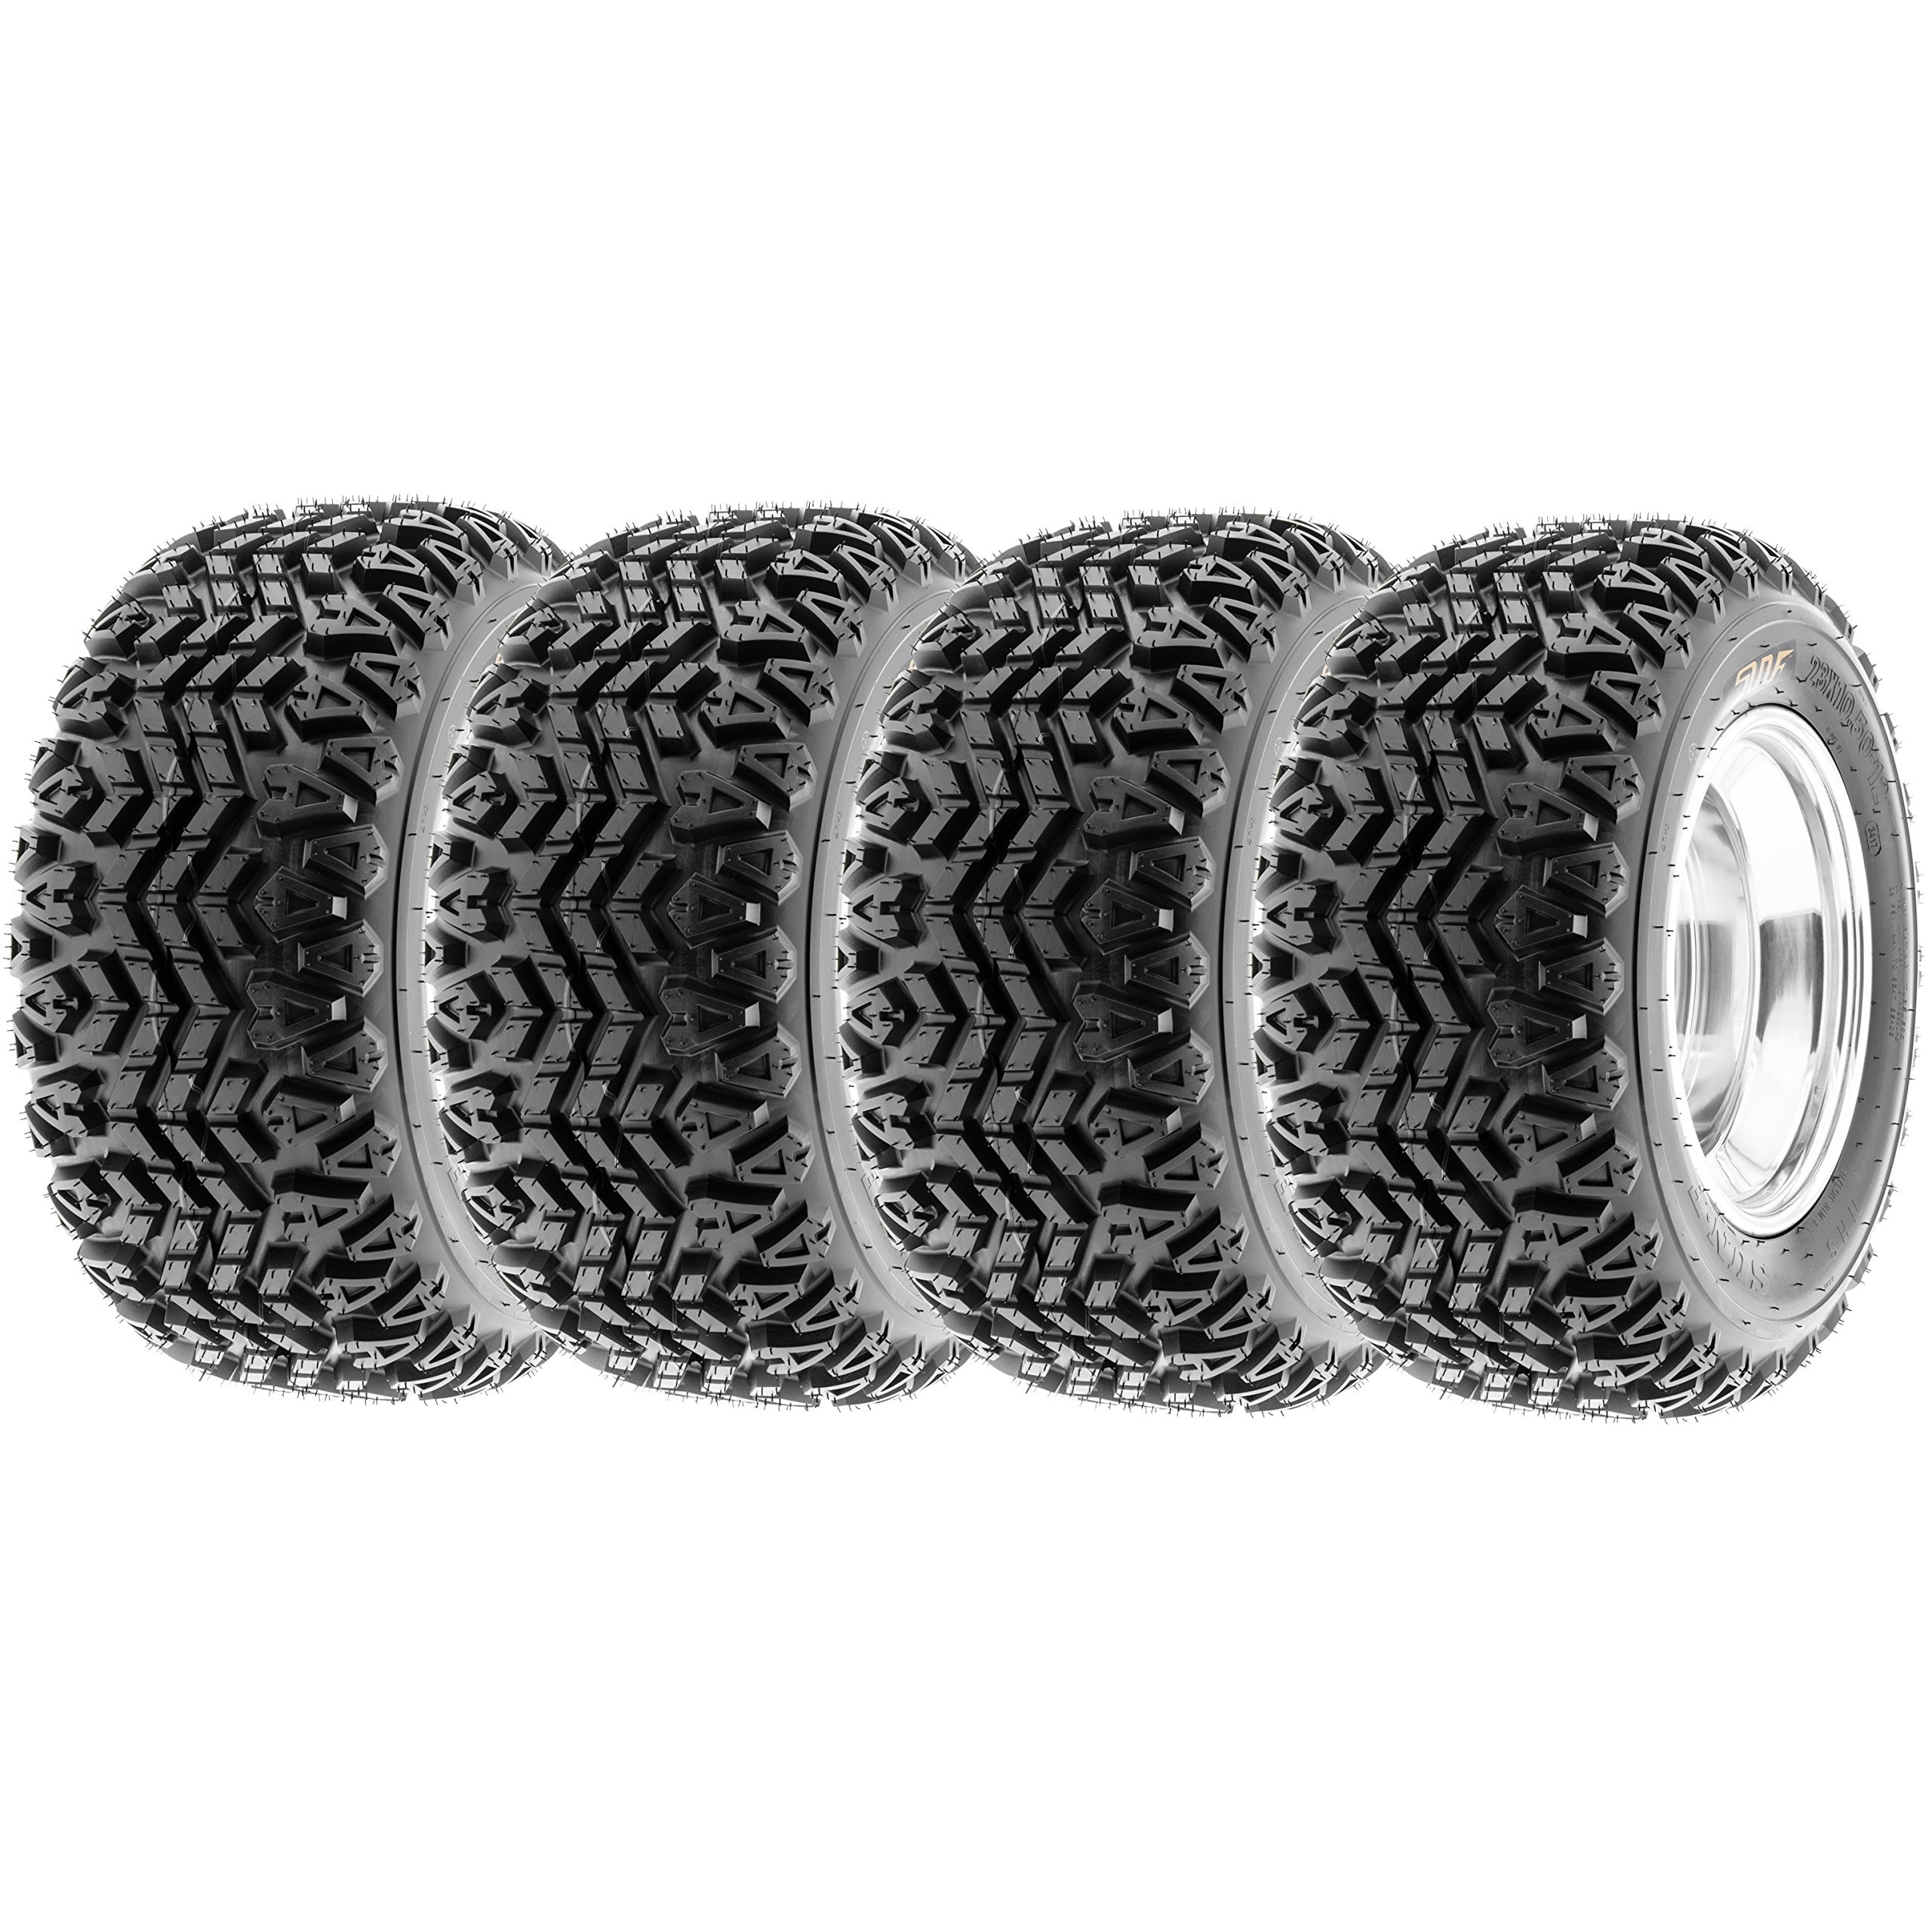 SunF All Trail ATV Tires 22x11-10 & 22x11x10 4 PR G003 (Full set of 4)